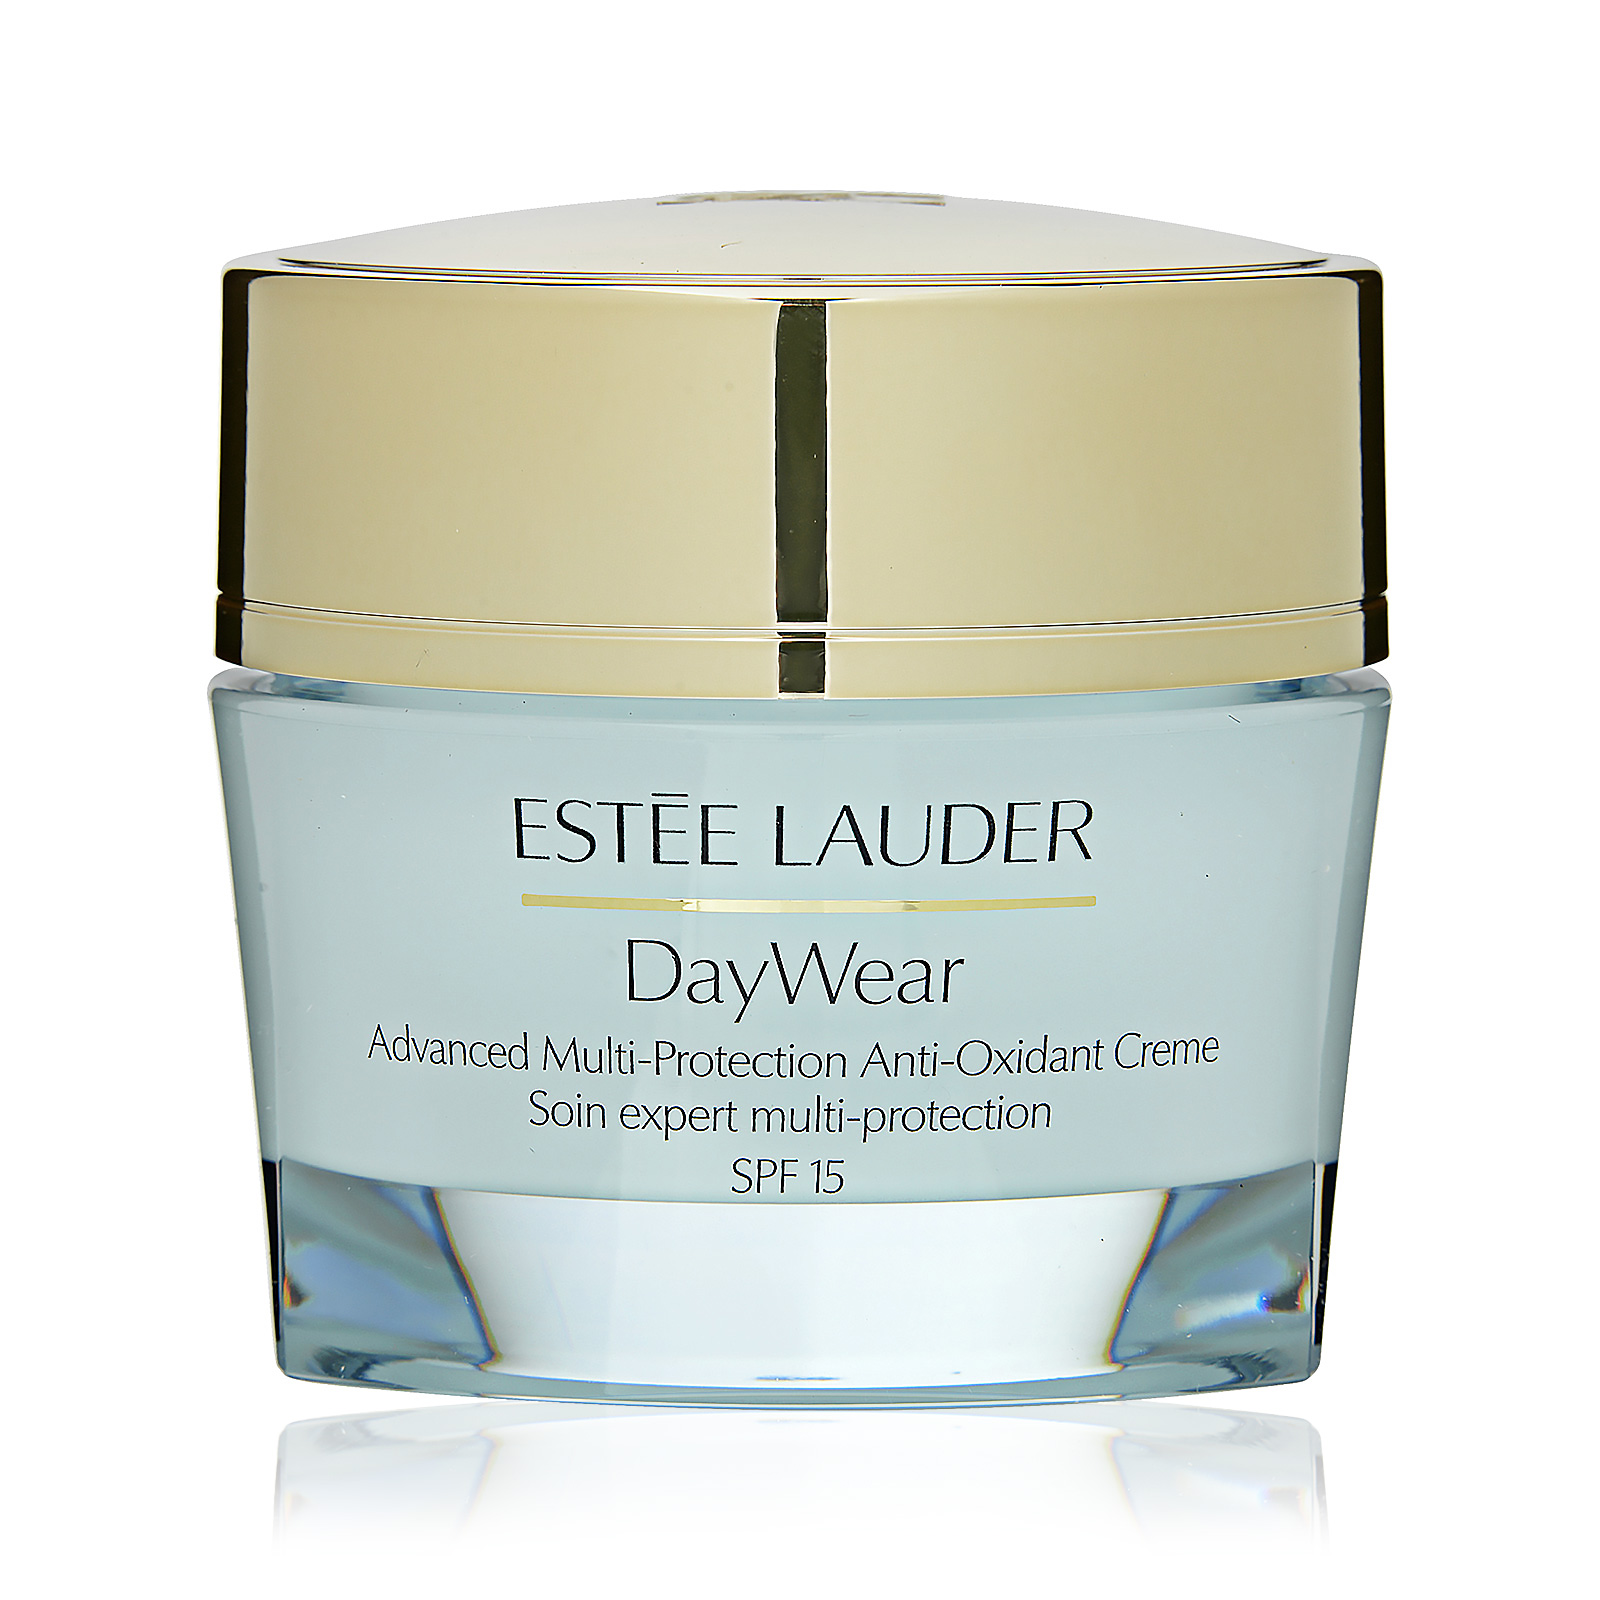 DayWear Advanced Multi-Protection Anti-Oxidant Creme SPF15 (Normal/Combination Skin)